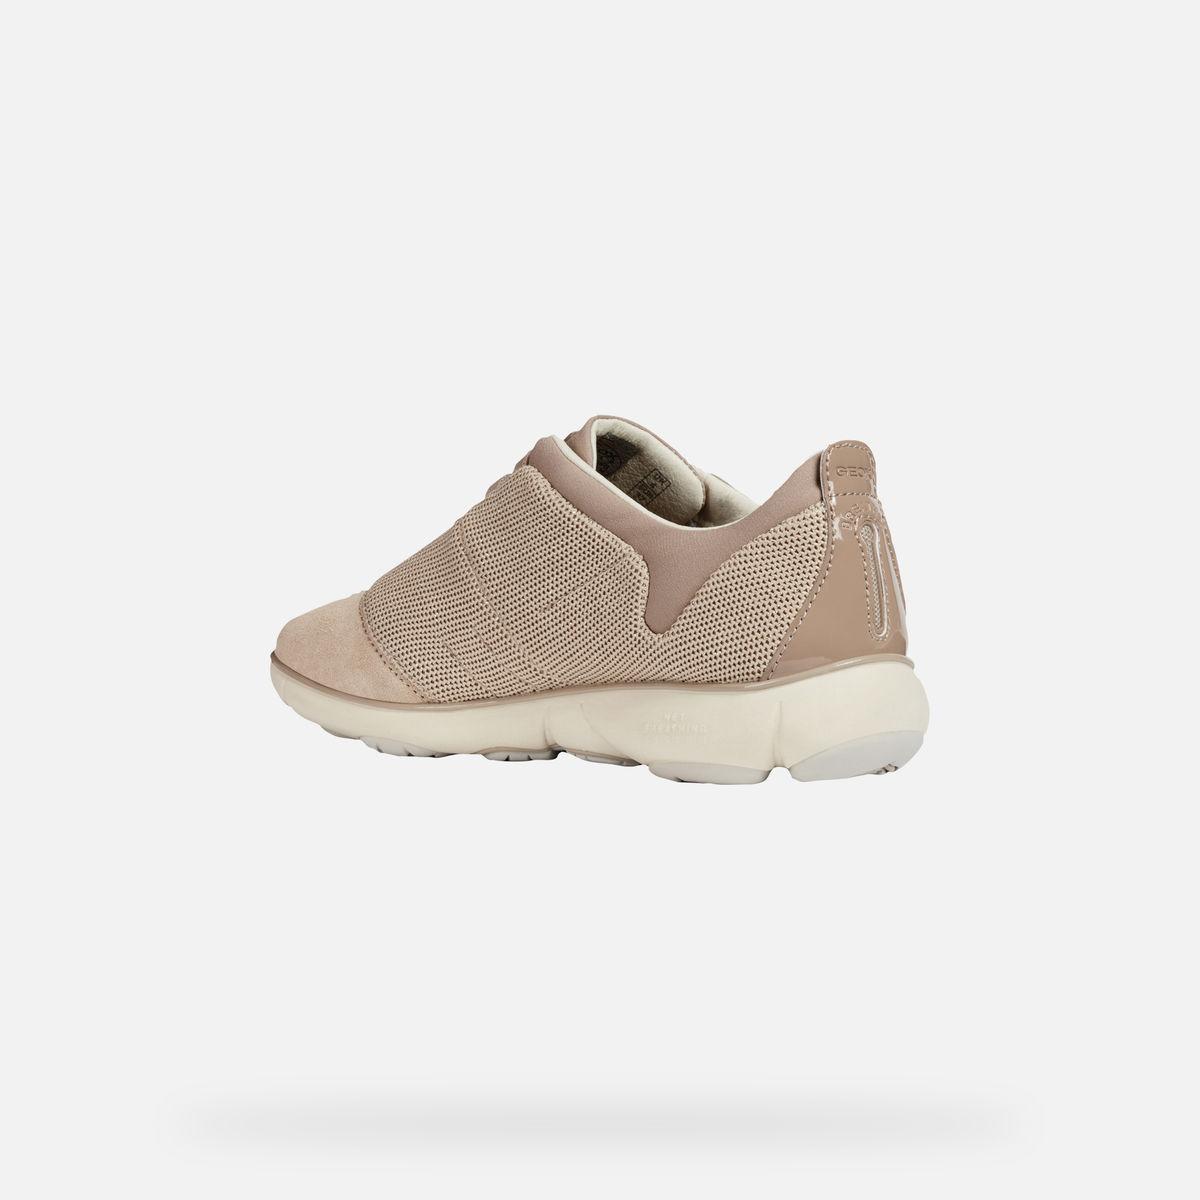 Pantofi dama GEOX NEBULA piele naturala suede D621EC 0EW22 C0423